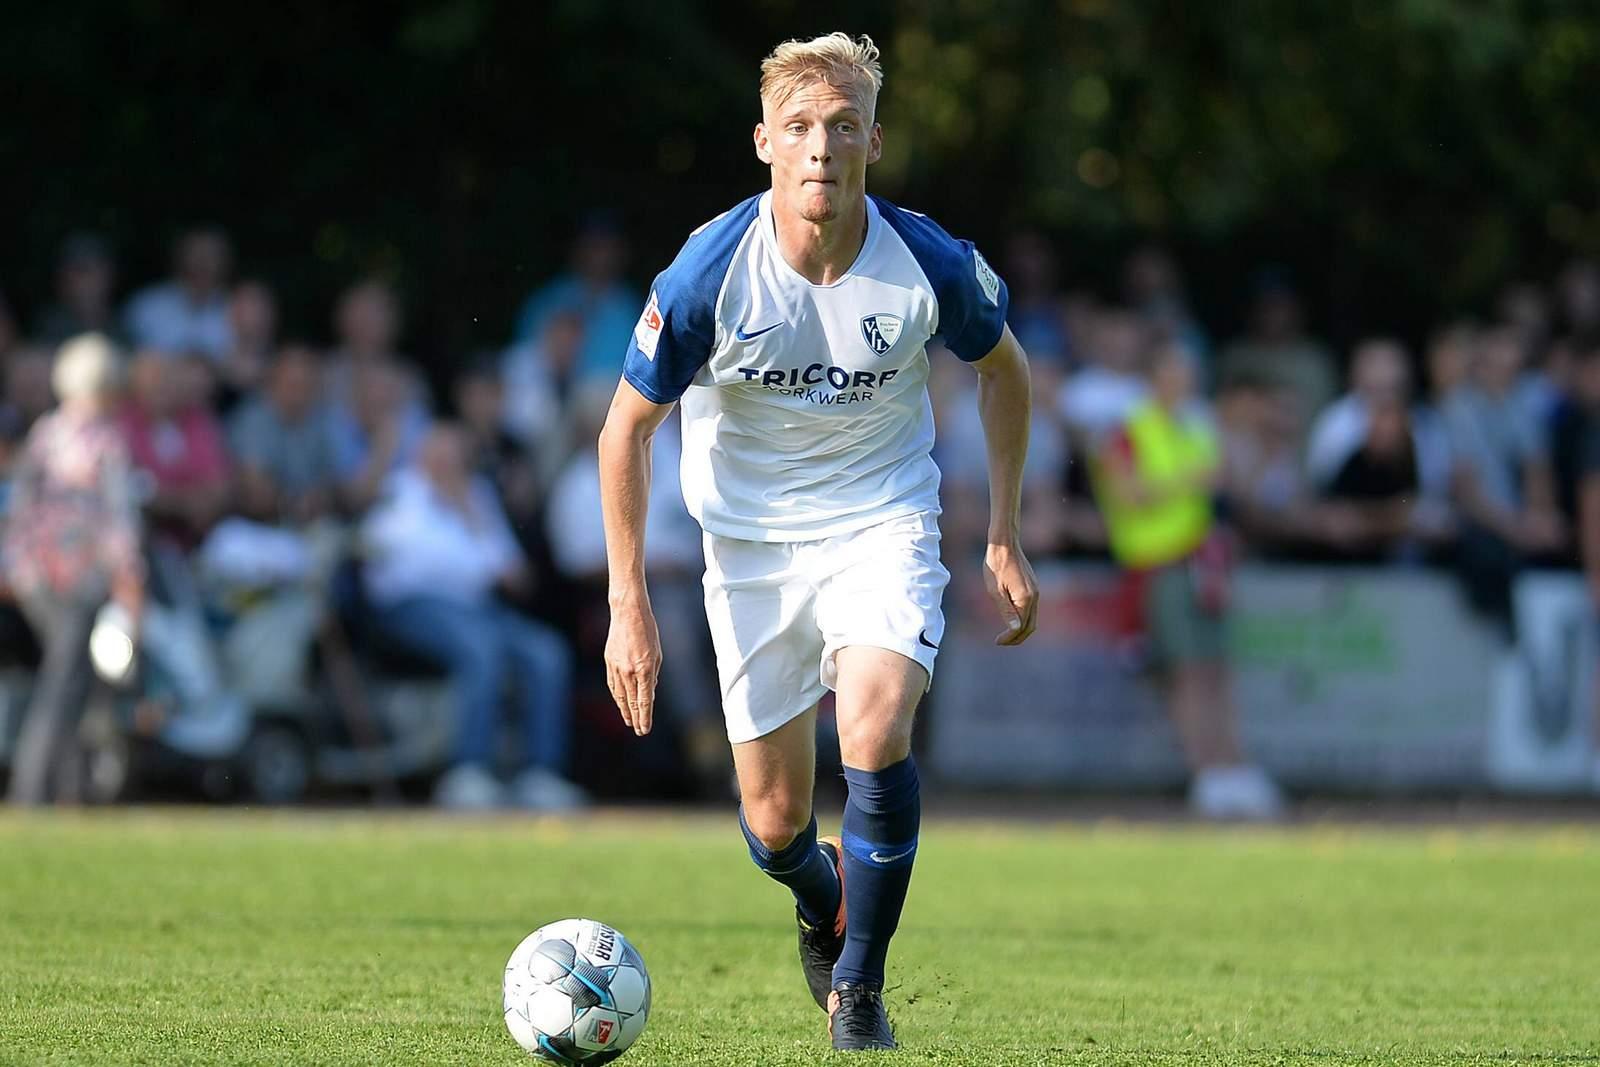 Saulo Decarli vom VfL Bochum